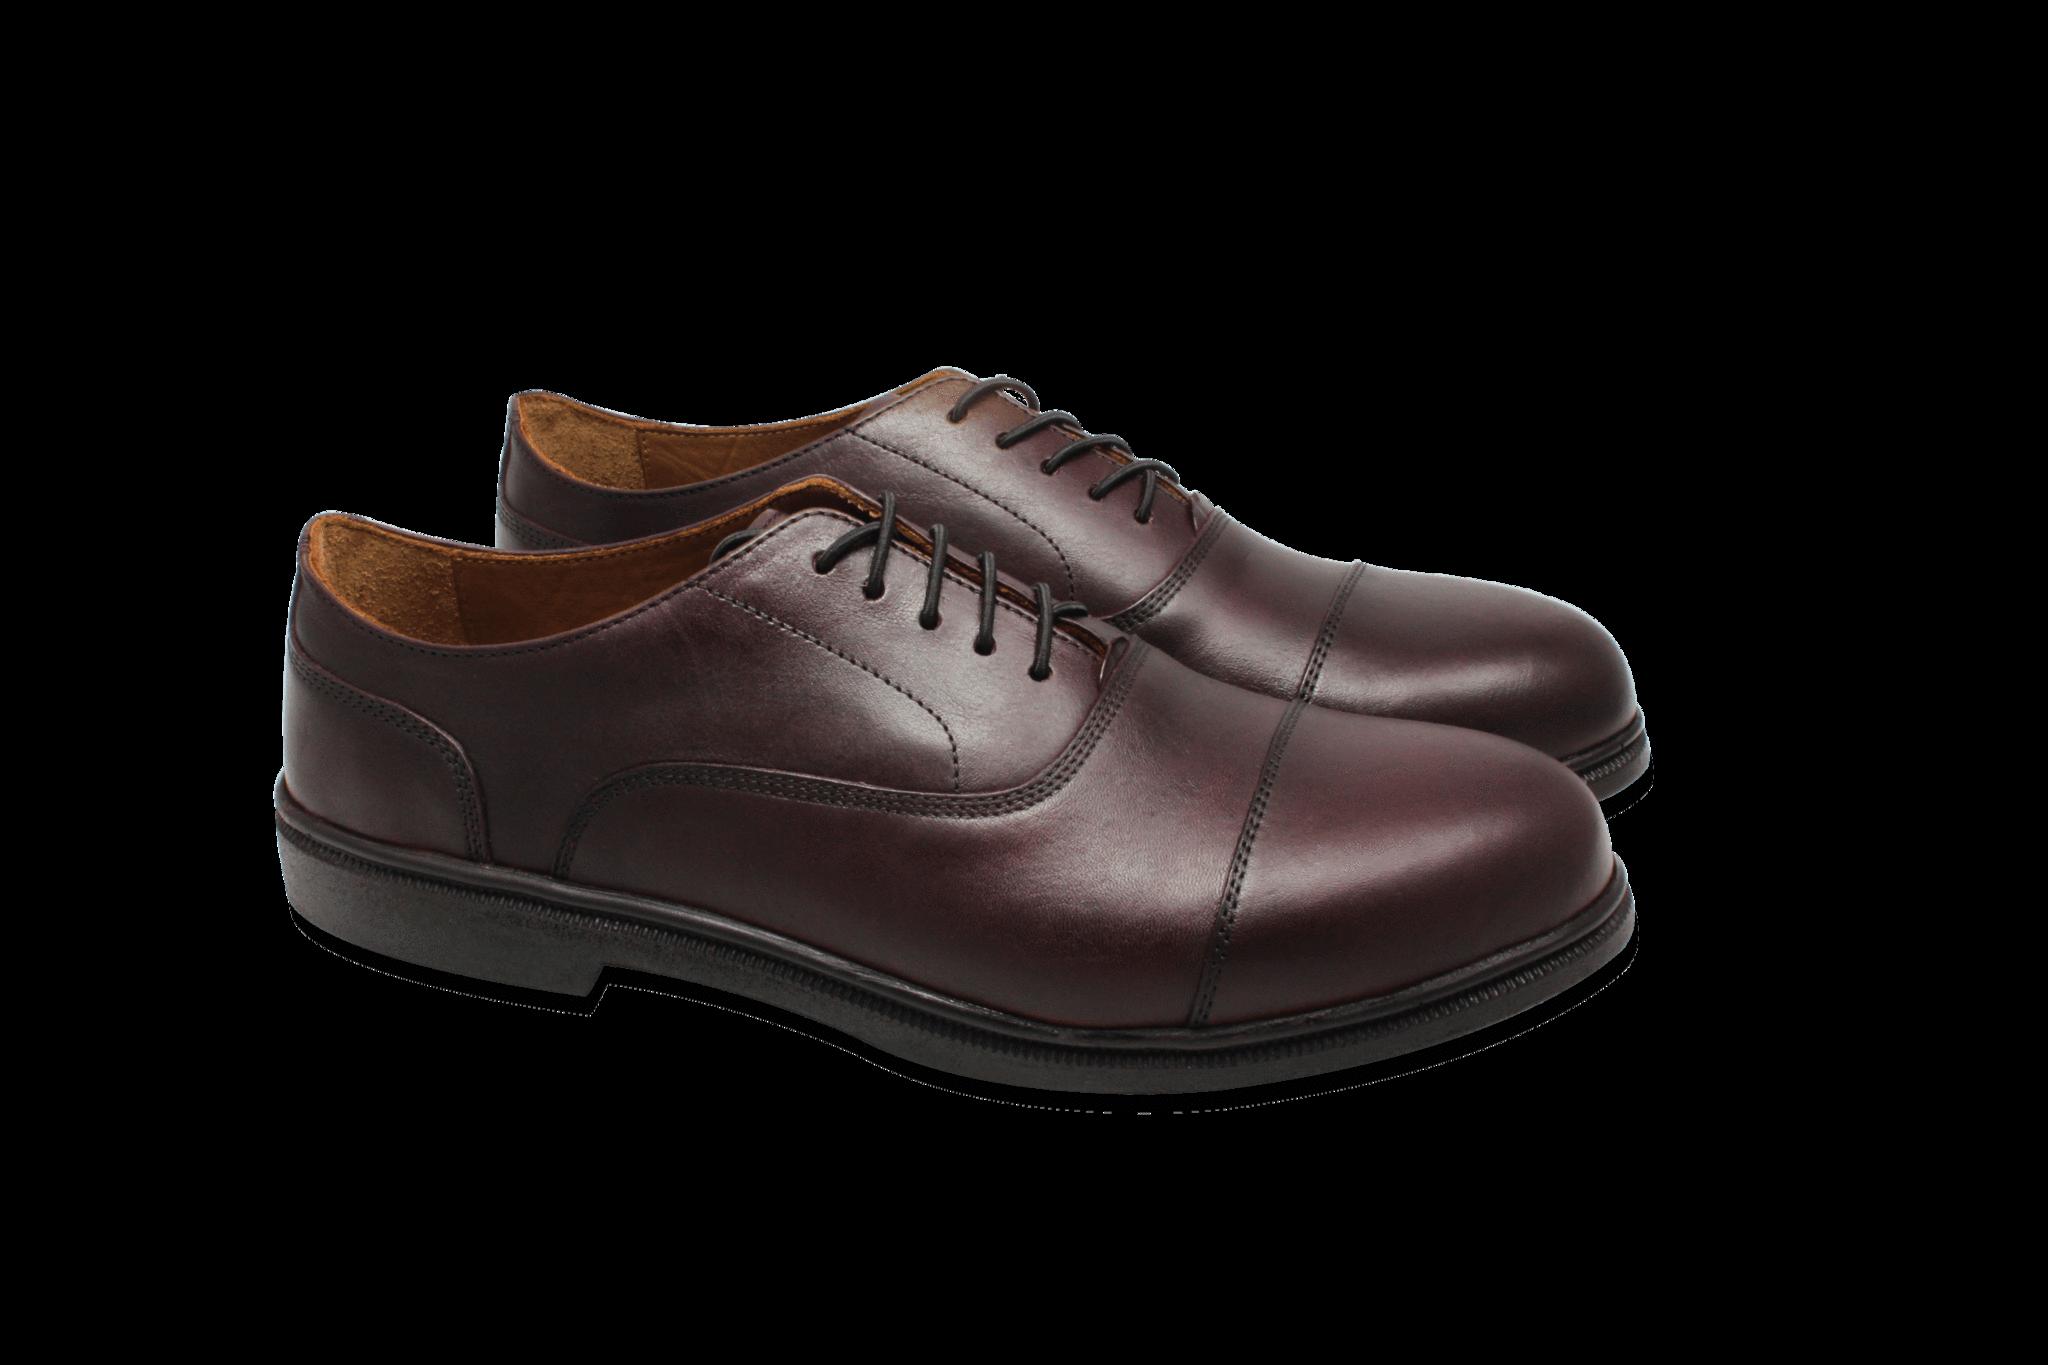 Carets Minimalist Dress Shoes With Hollow Heel Feet Feet Feet